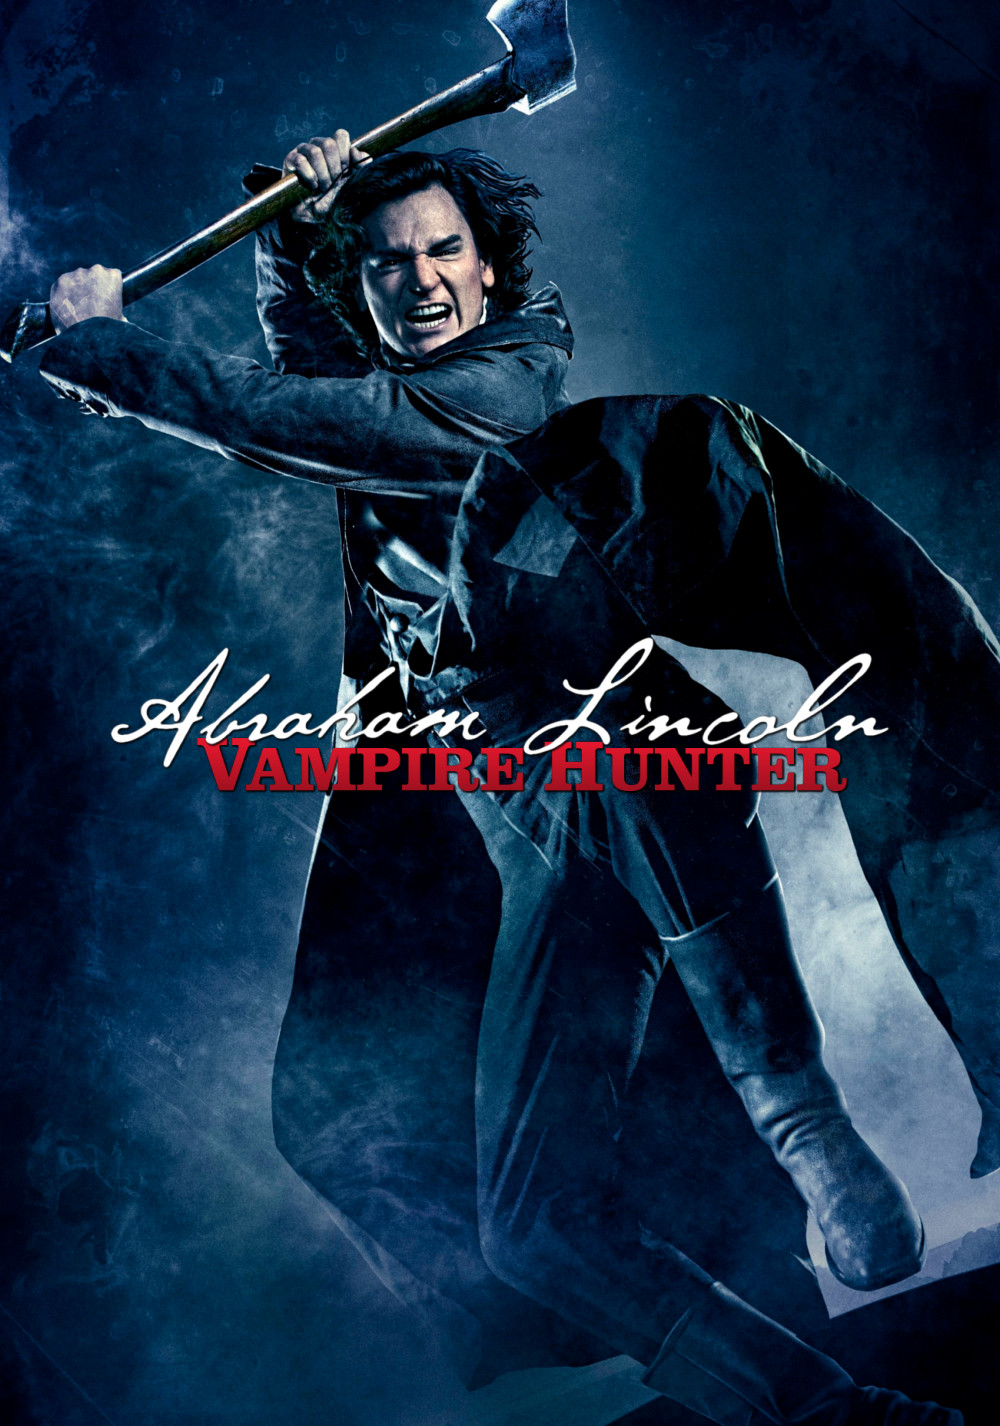 abraham lincoln vampire hunter download